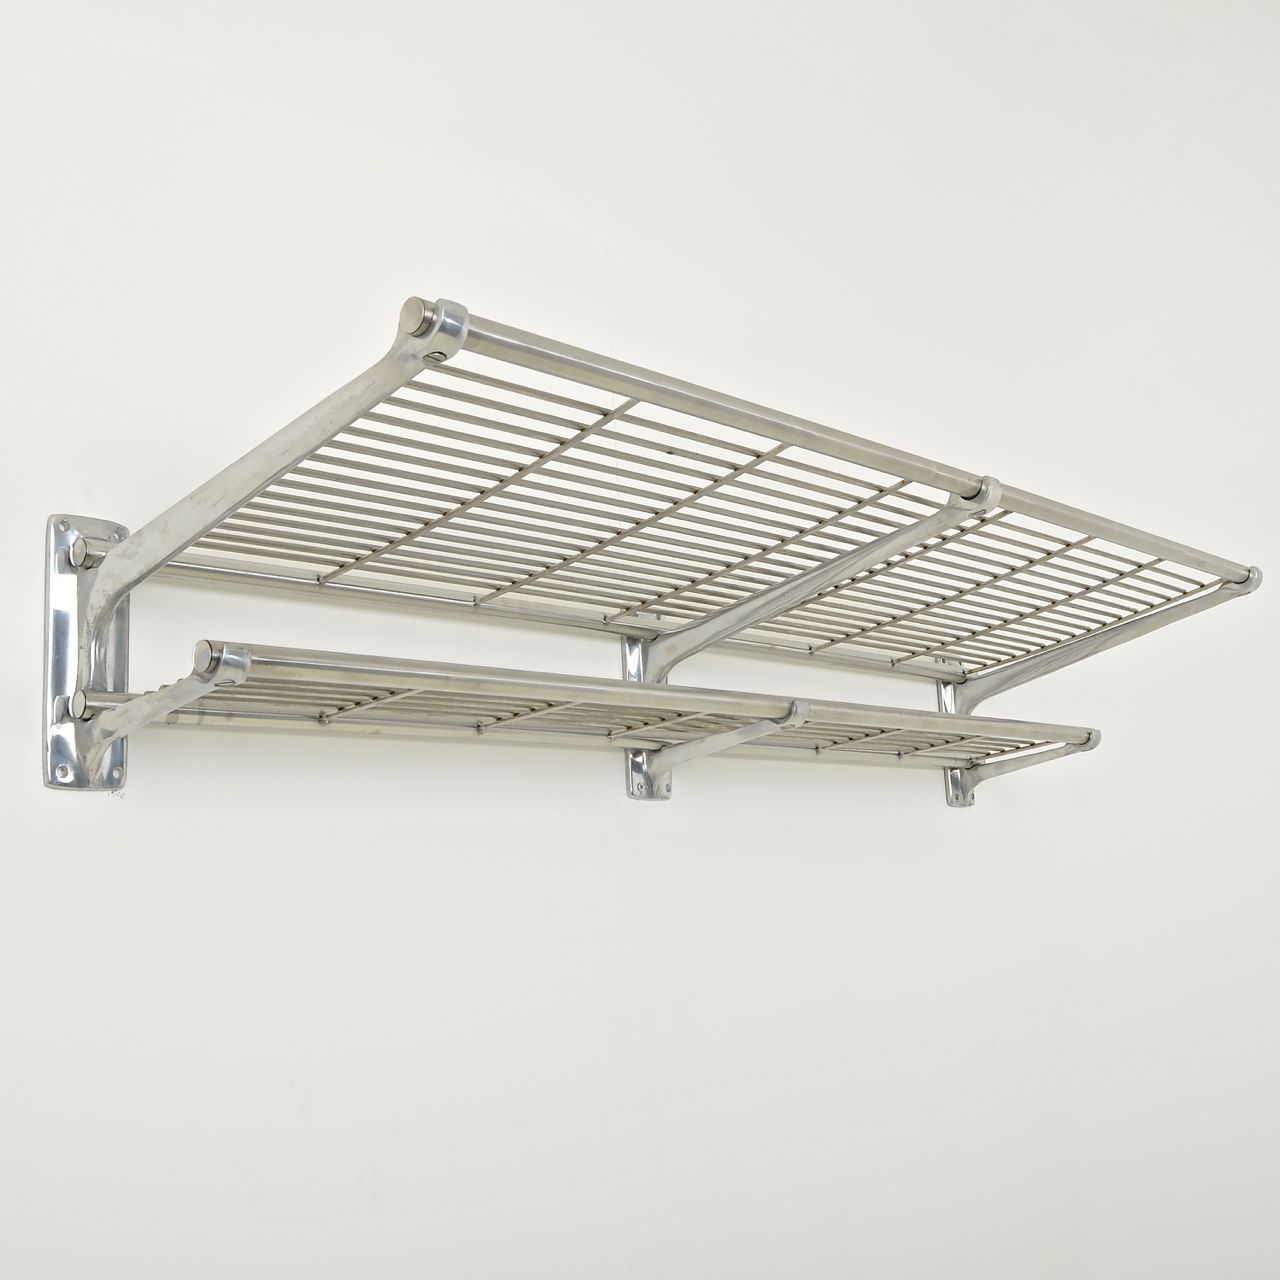 railway luggage rack cast aluminium brackets and welded steel mesh